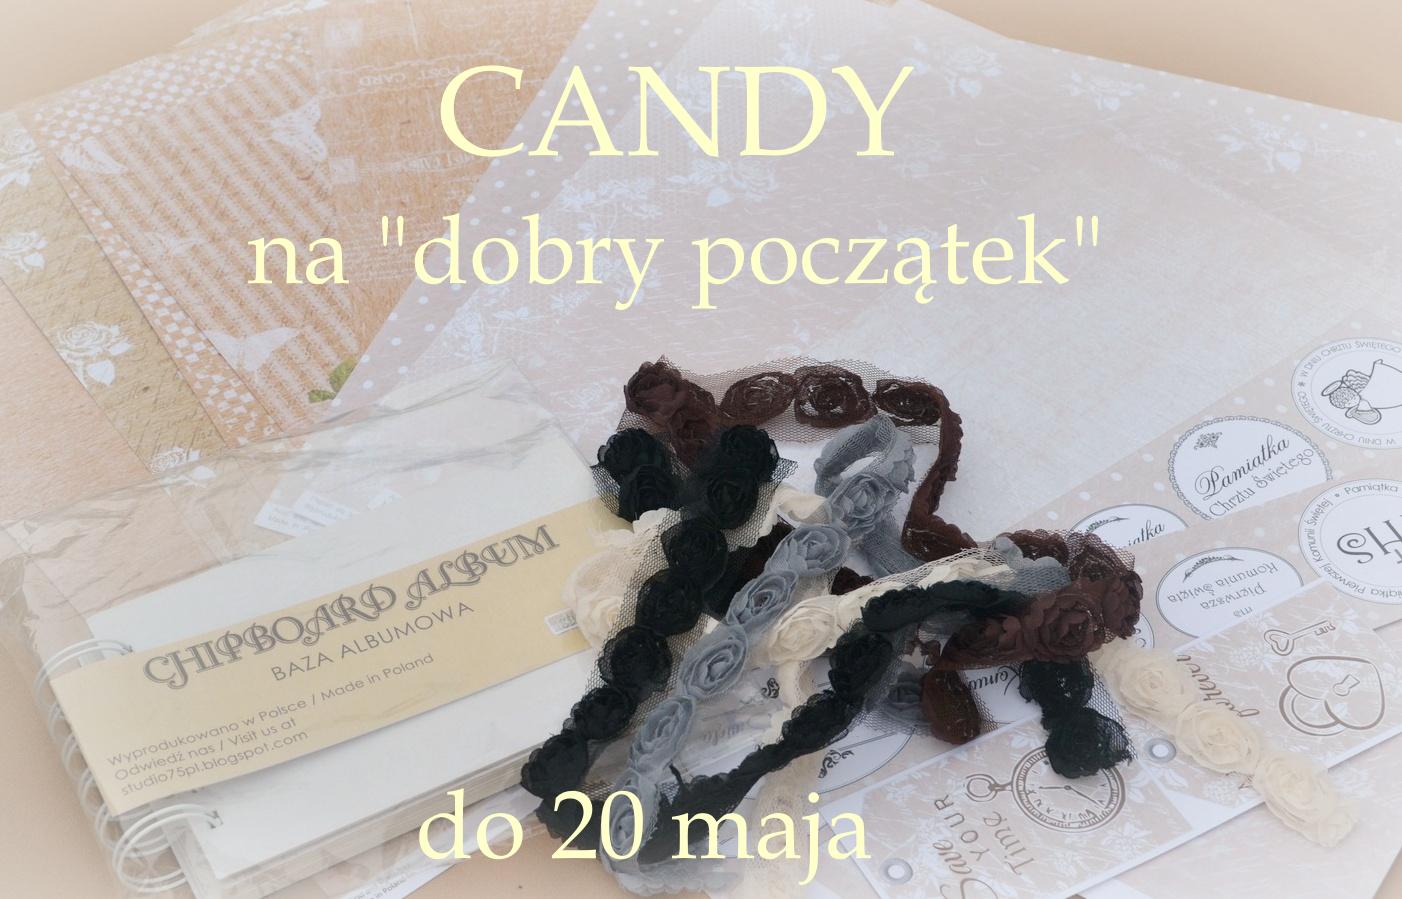 http://www.imaginartis.com/2014/05/candy-na-dobry-poczatek.html